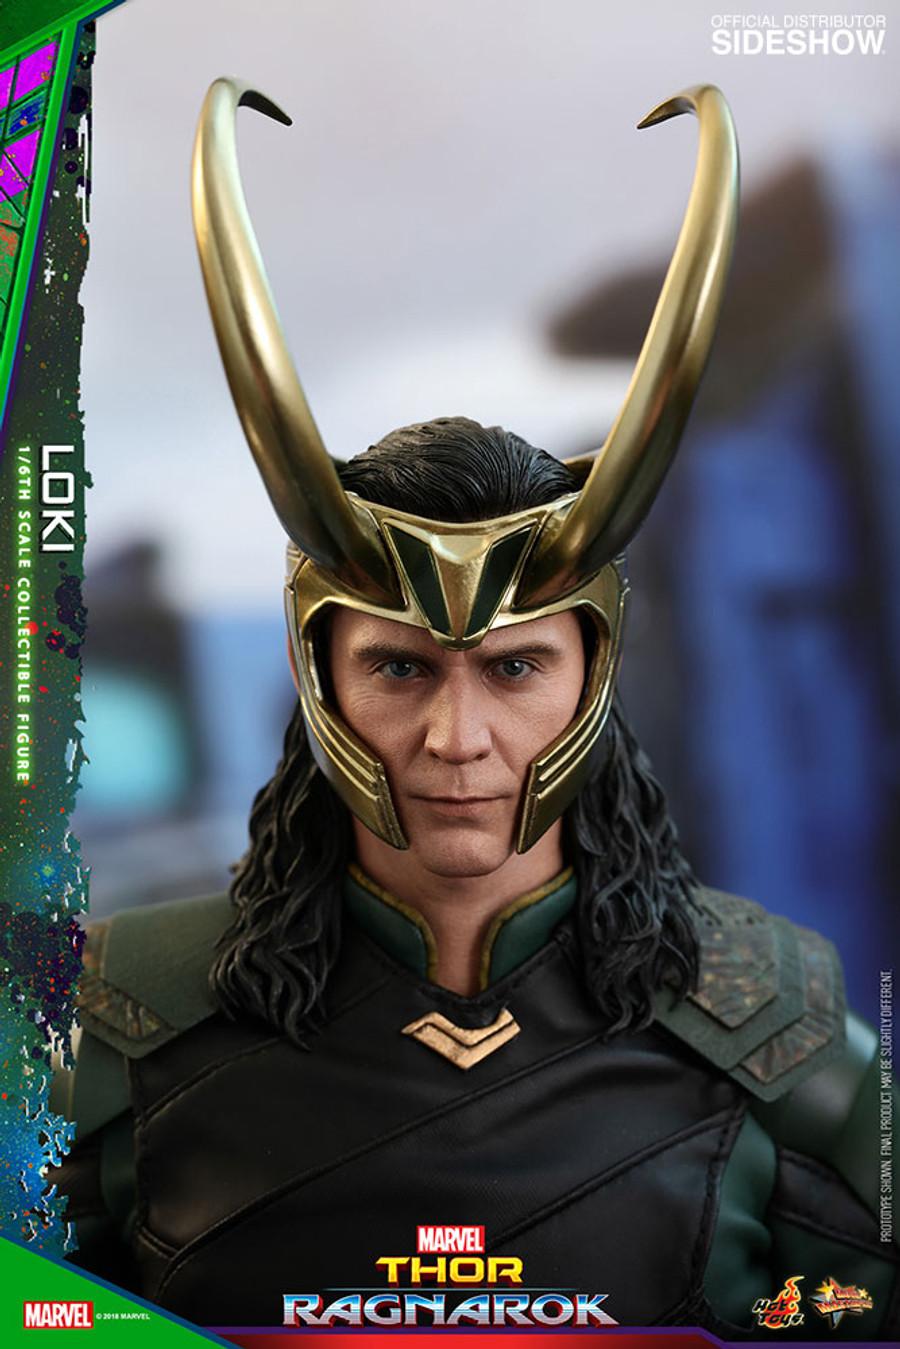 Hot Toys - Thor: Ragnarok - Loki